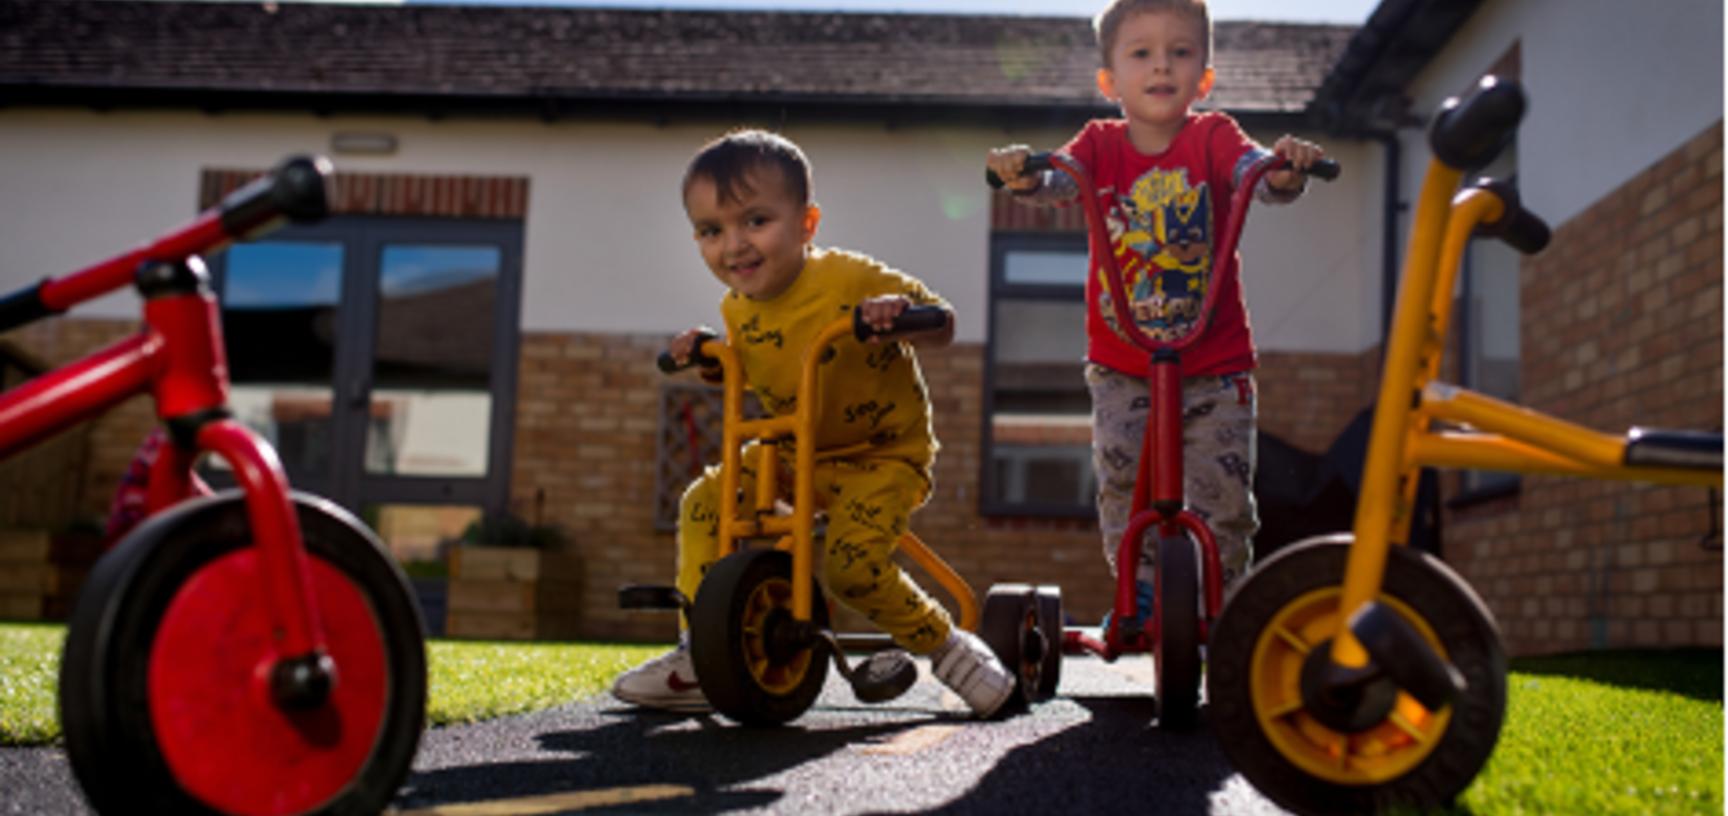 children on bikes in sunny garden